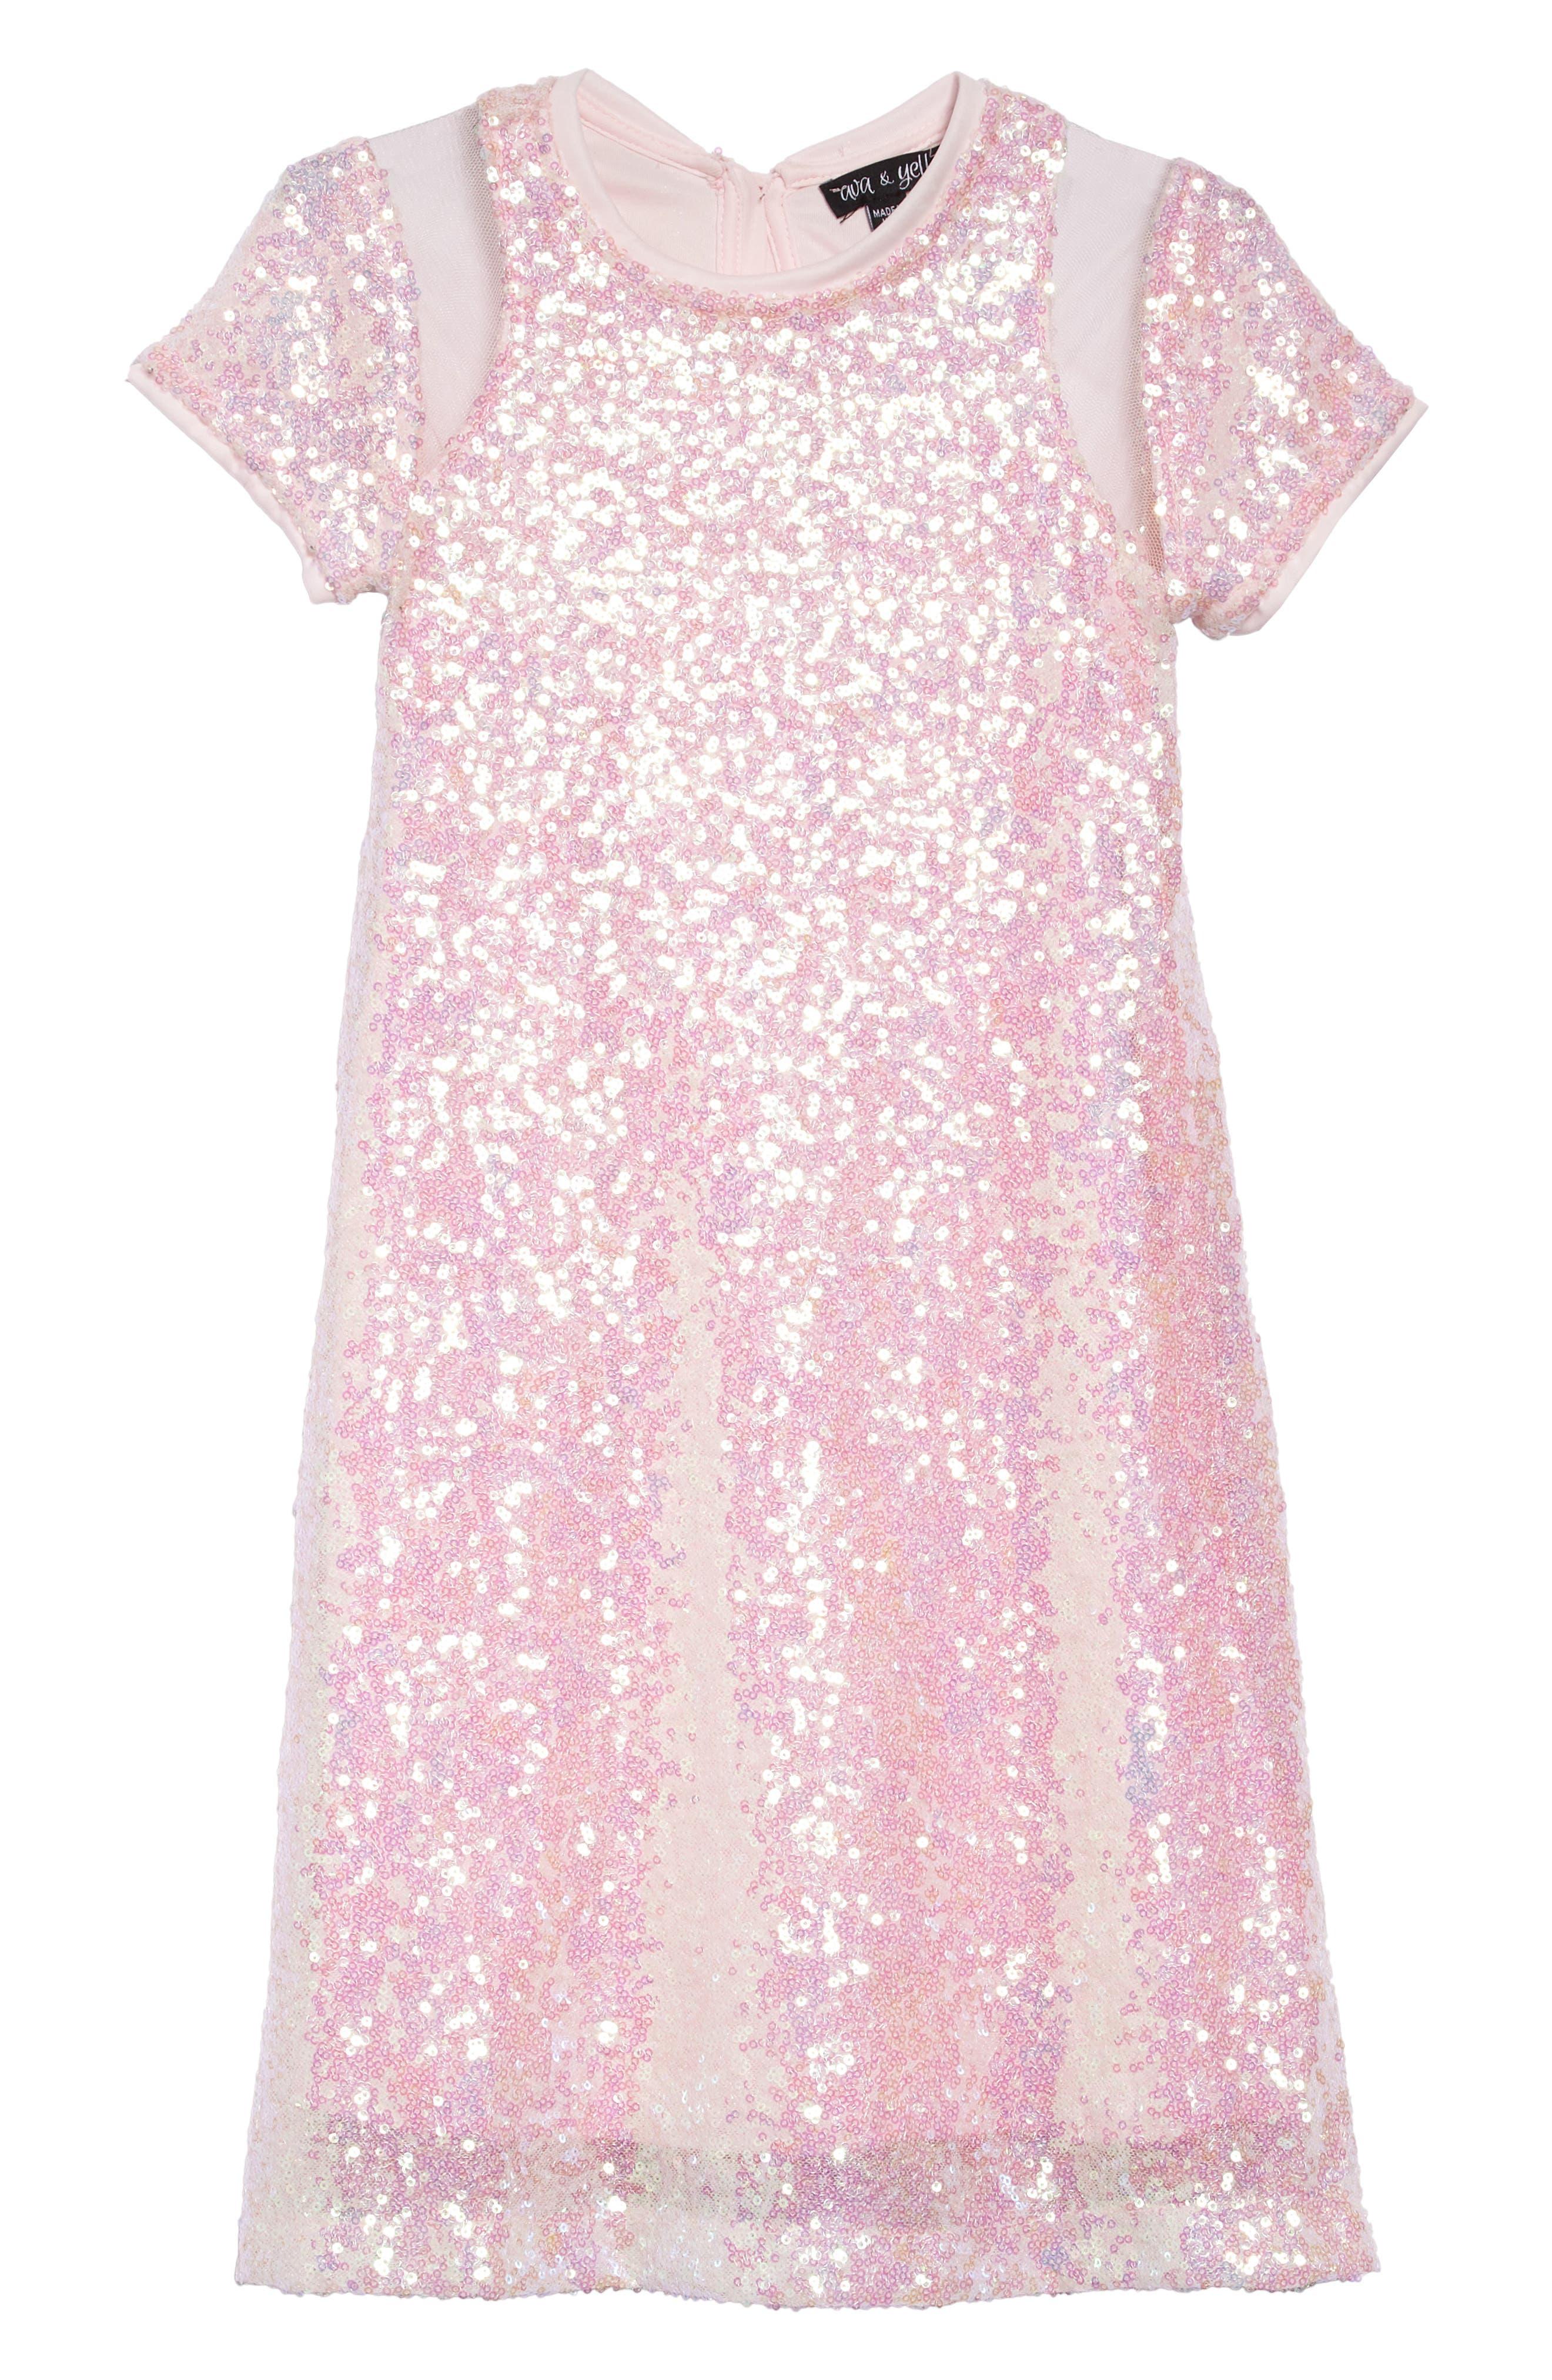 Sequin Sheath Dress,                             Main thumbnail 1, color,                             650